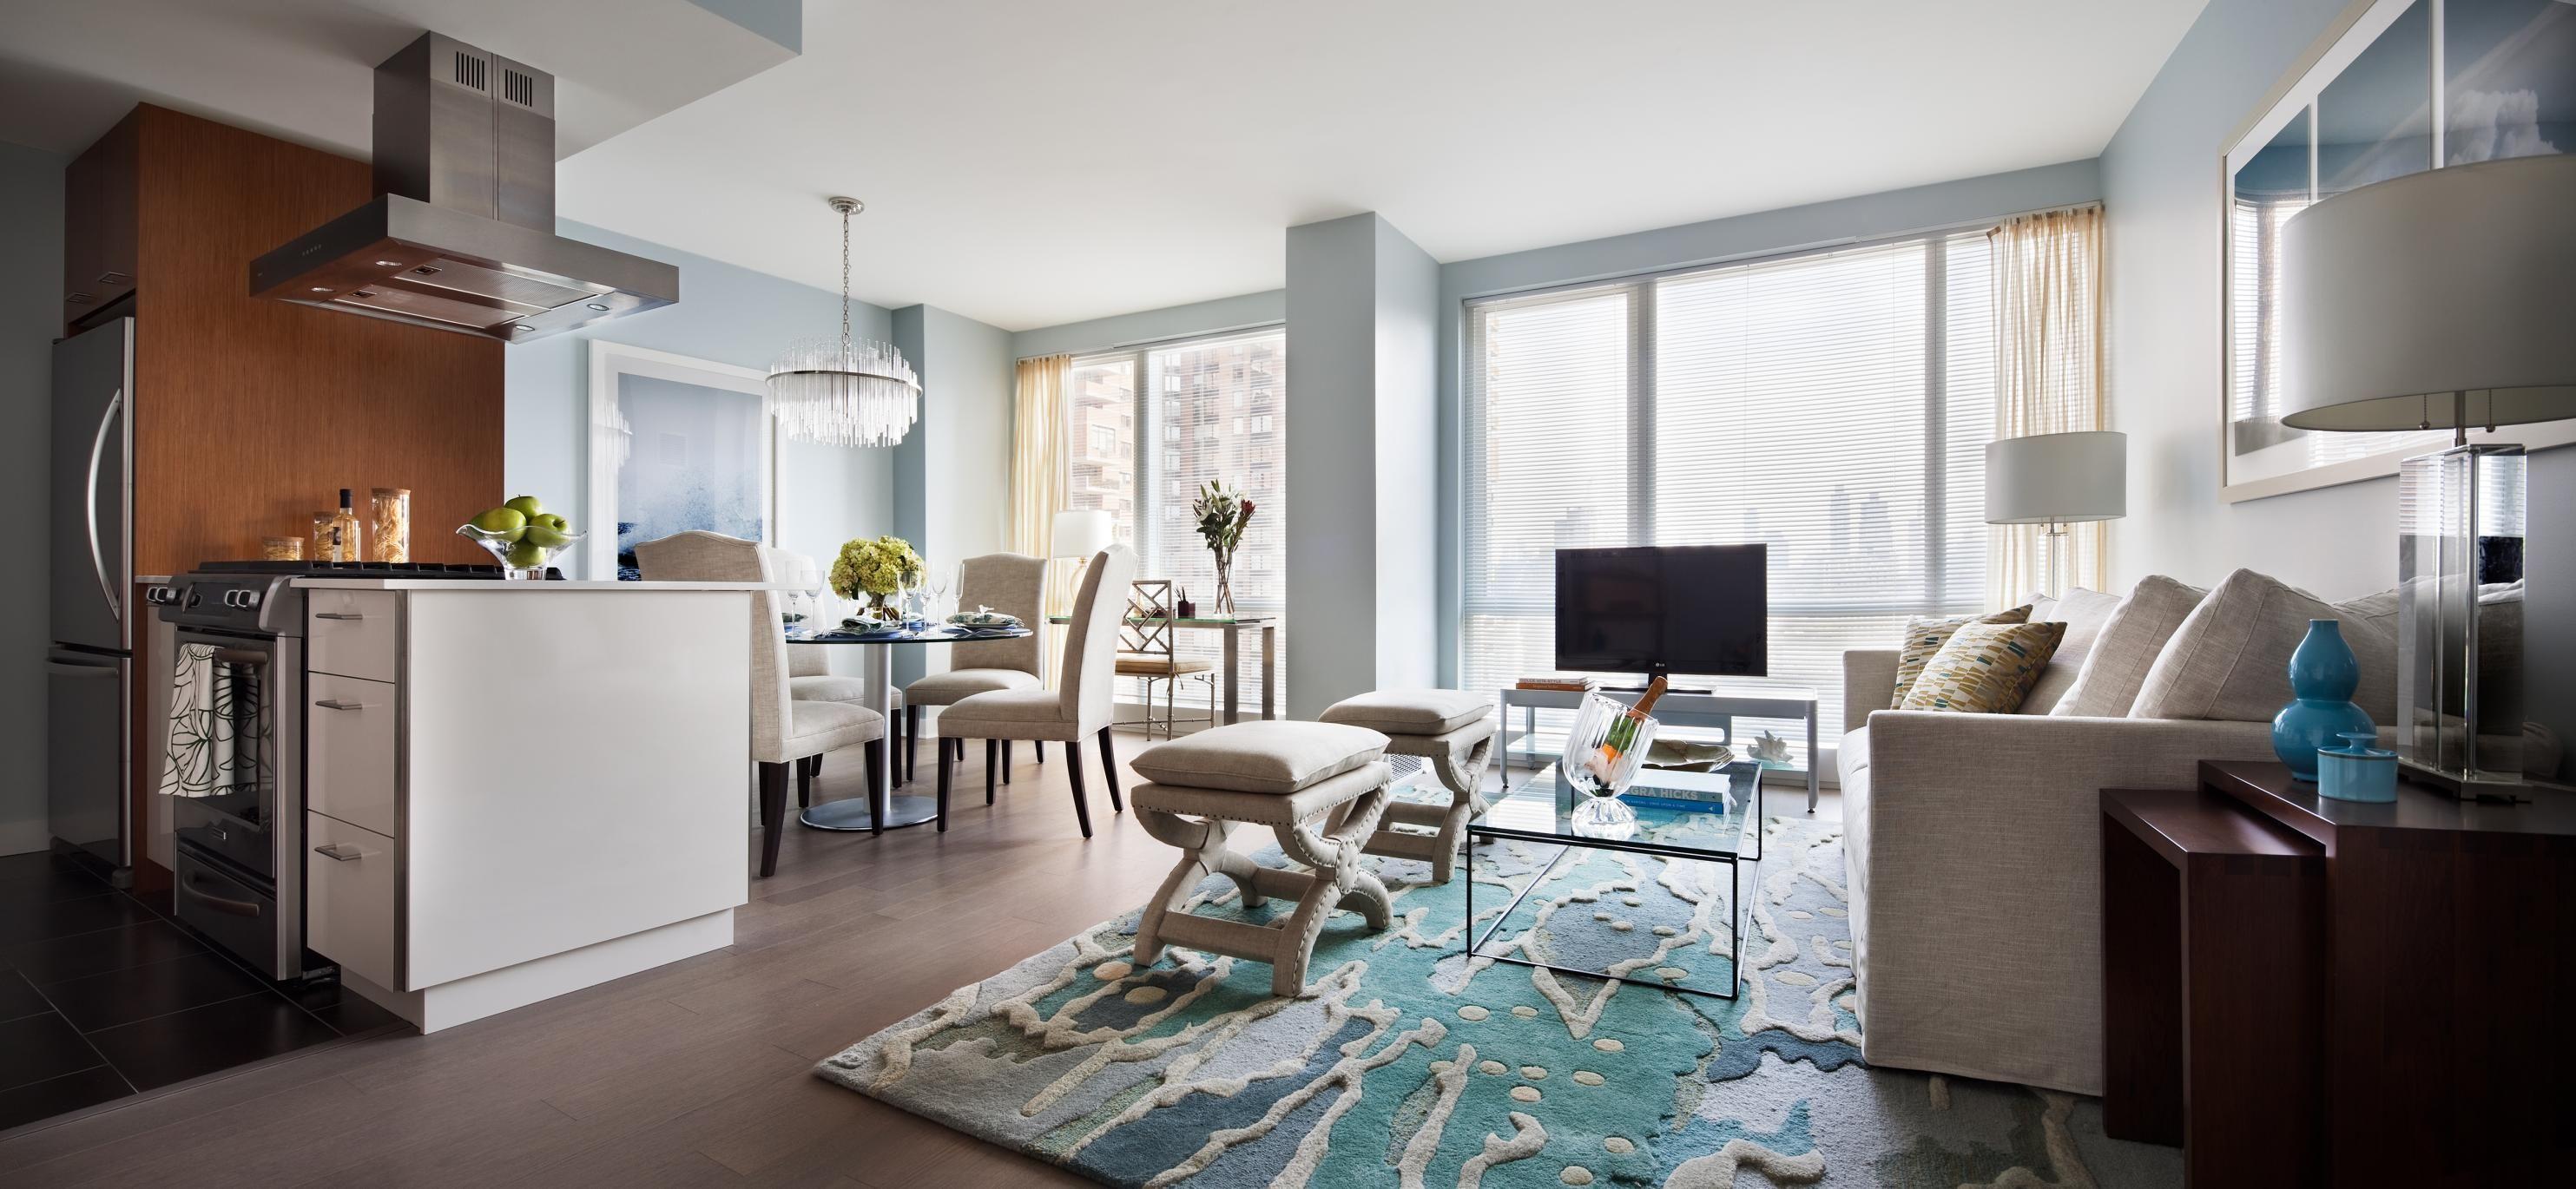 Mima Luxury Rental Apartments In Midtown Manhattan New York City Apartment Decorating Rental Luxury Rentals Apartment Interior